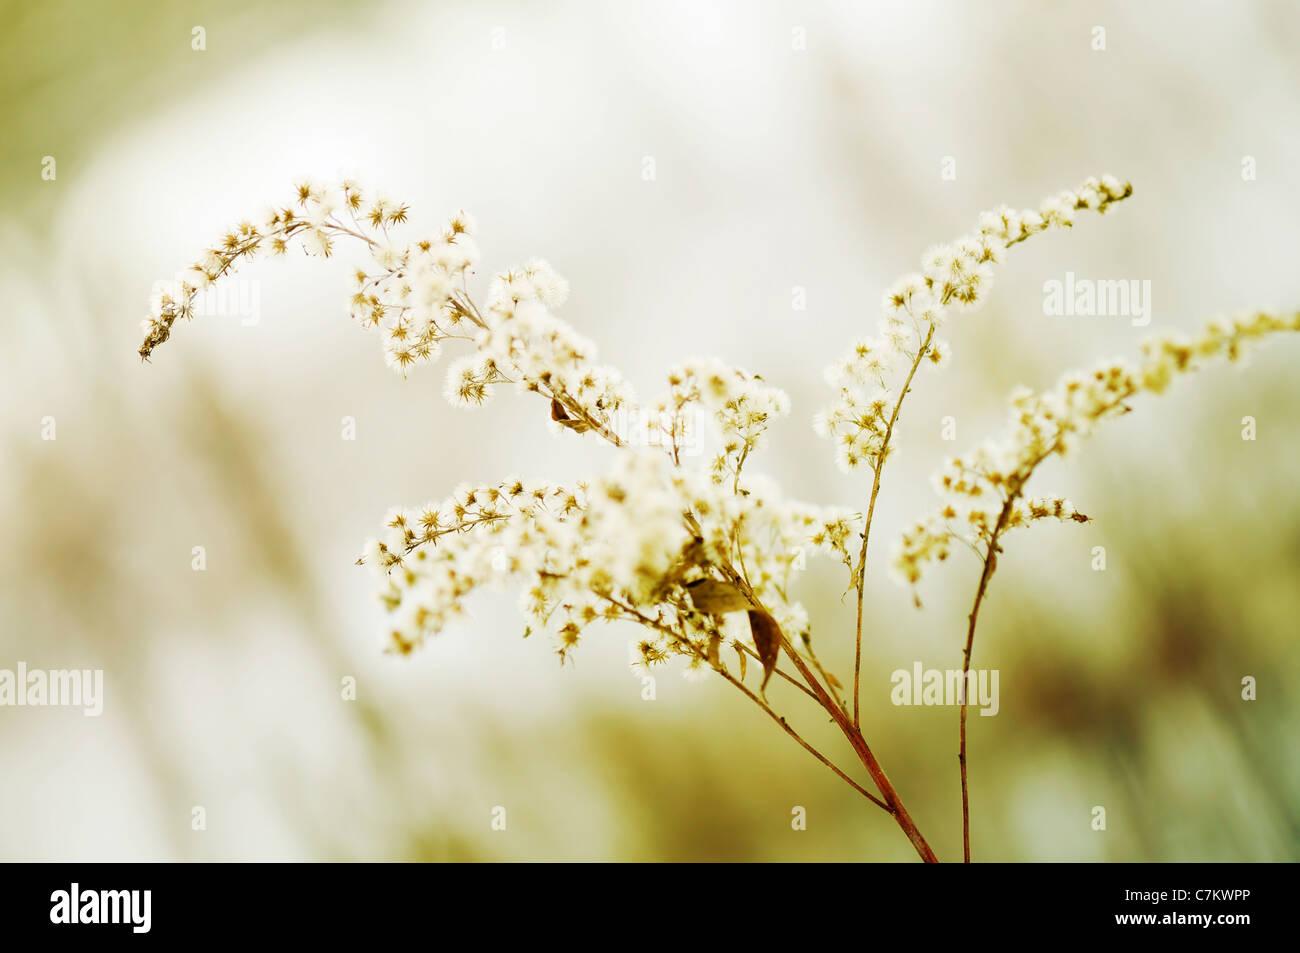 Wonderful dried flower - Stock Image